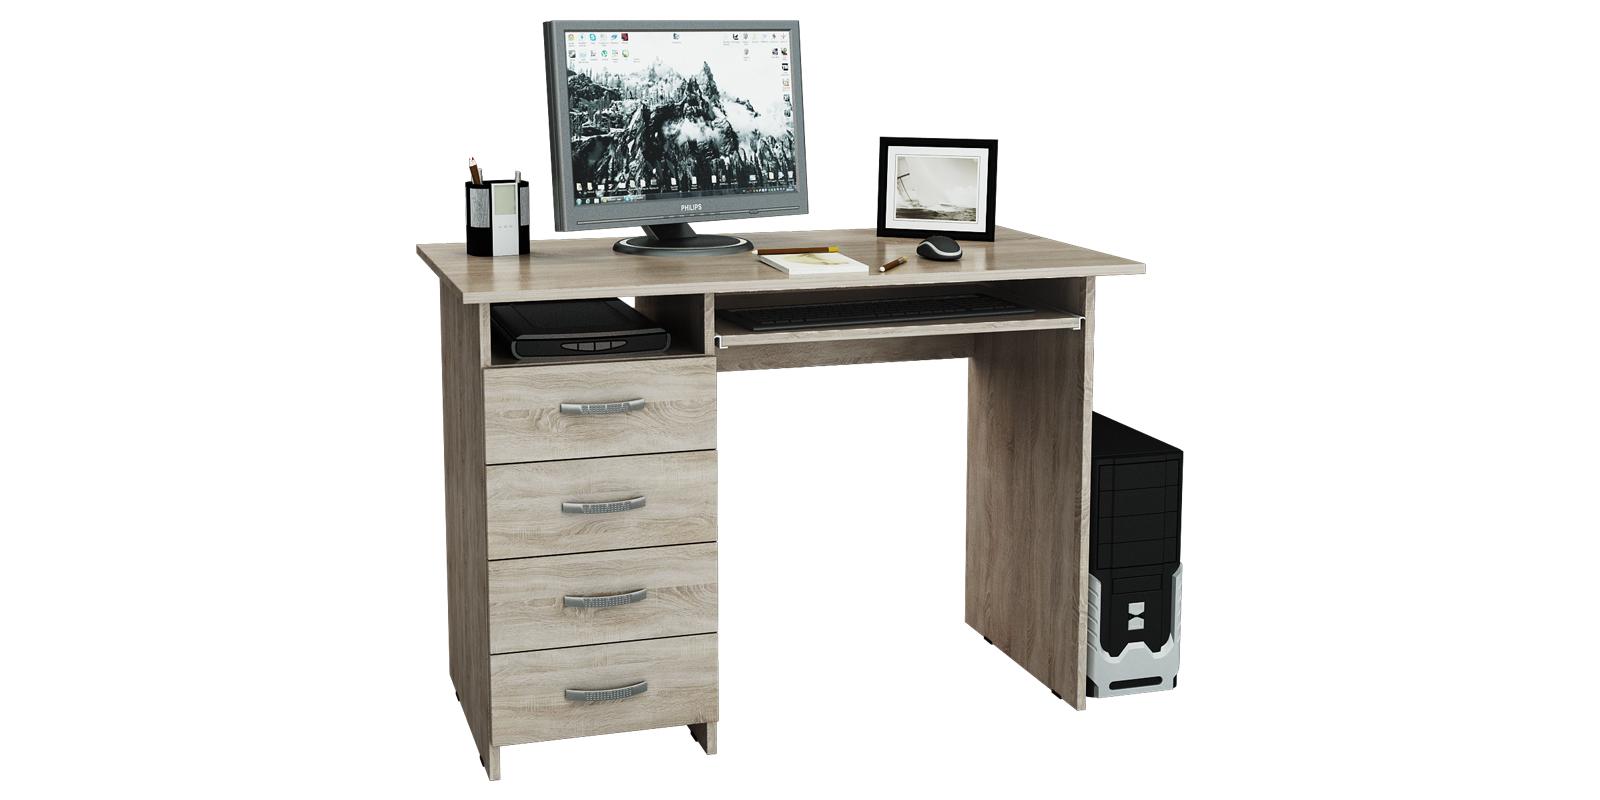 Стол компьютерный Харви левый (дуб сонома)